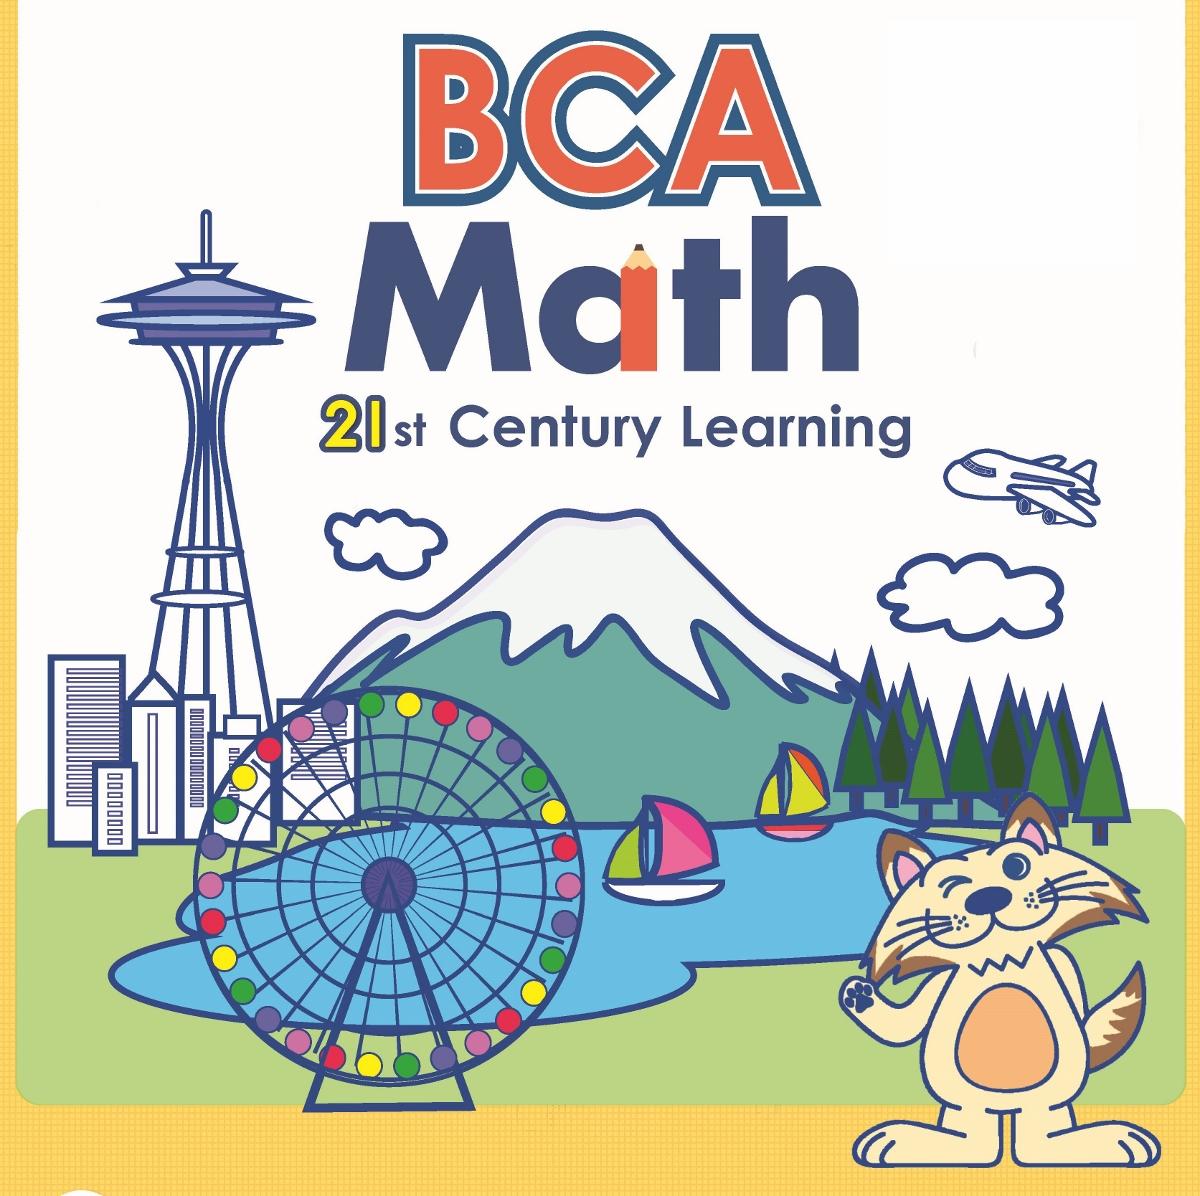 BCA Math - Bellevue Children's Academy